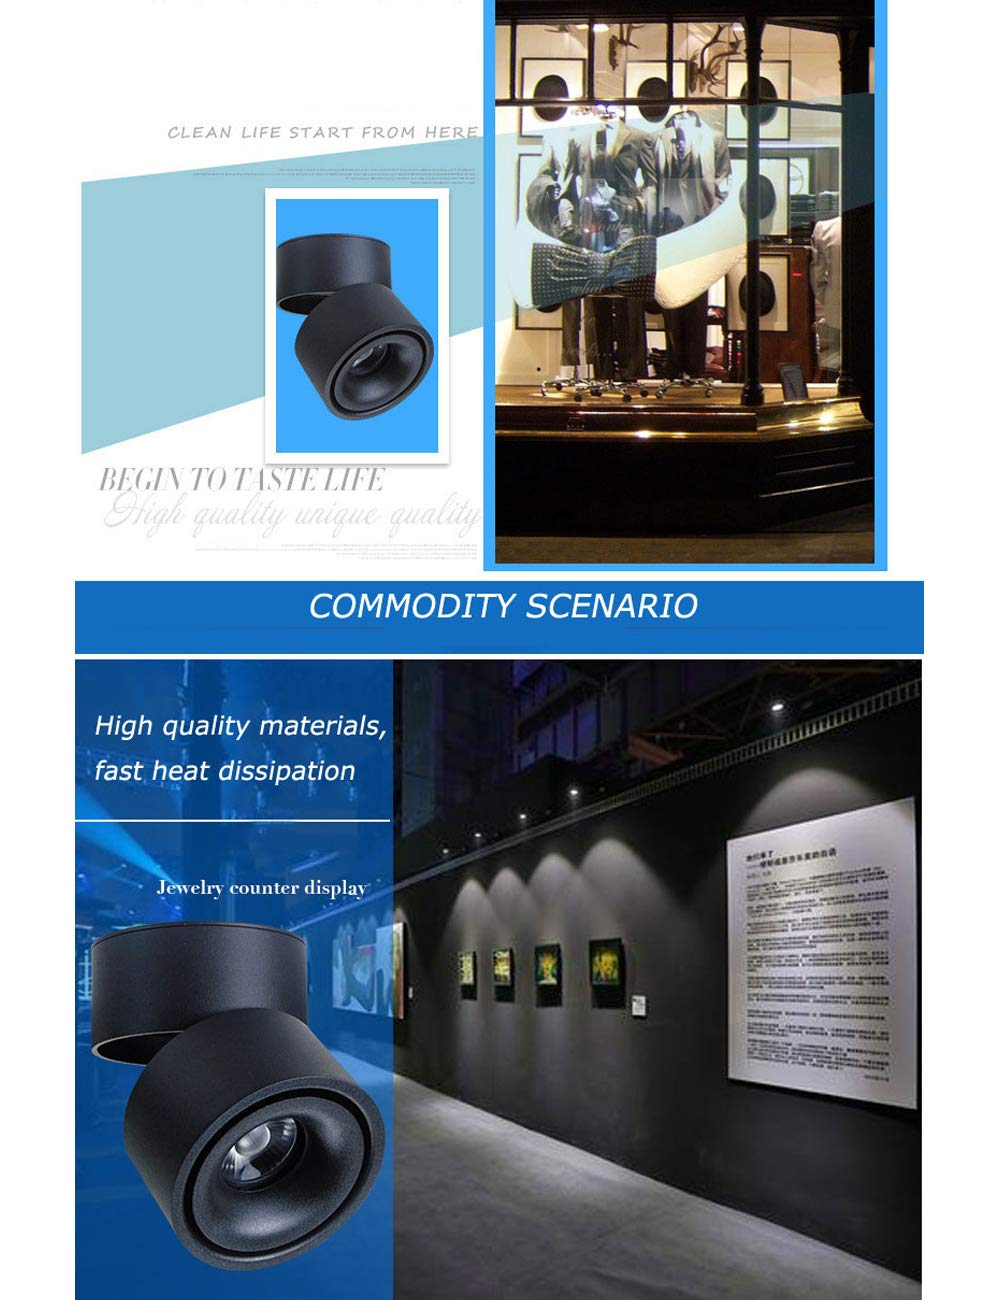 360/°Adjustable Aluminum,Rotatable for Kitchen Bathroom Corridor,10w 12w 15w SPDYCESS 1 X LED Surface Mounted COB Lighting Spotlight Ceiling Downlight